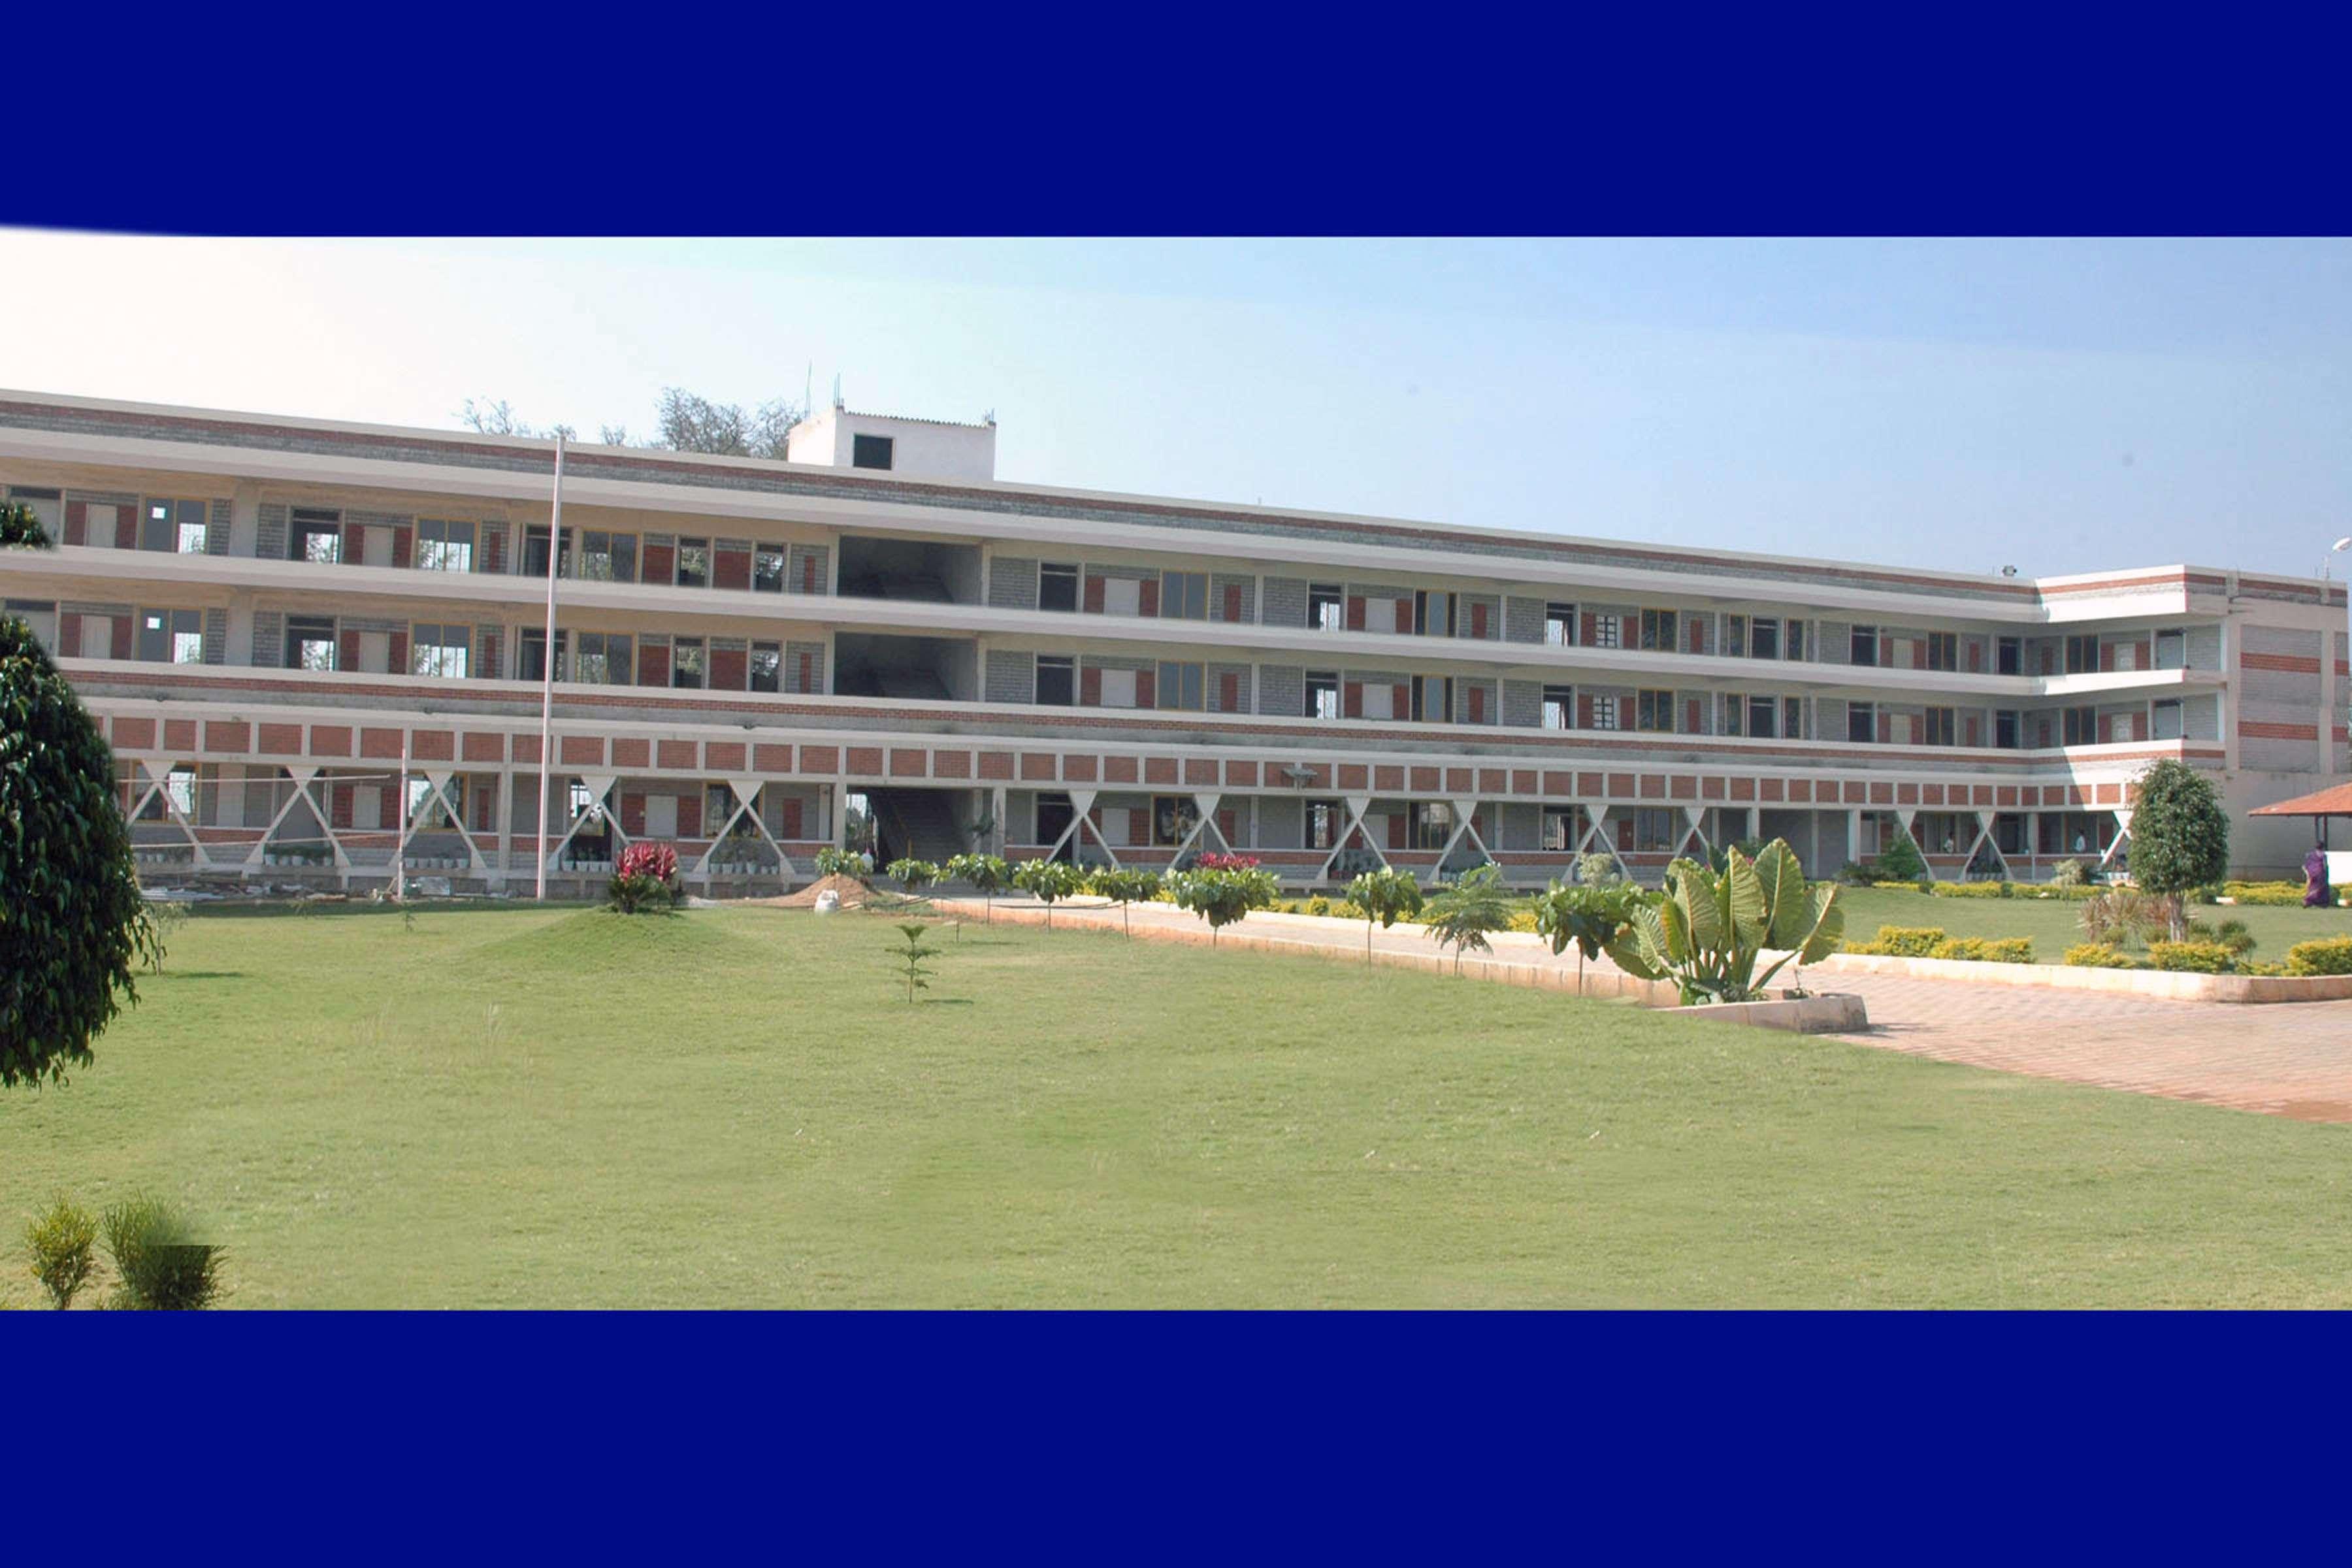 M S V Public School M S Vidya Peeta Trust Nelamanagala RoadDoddaballapur 830343